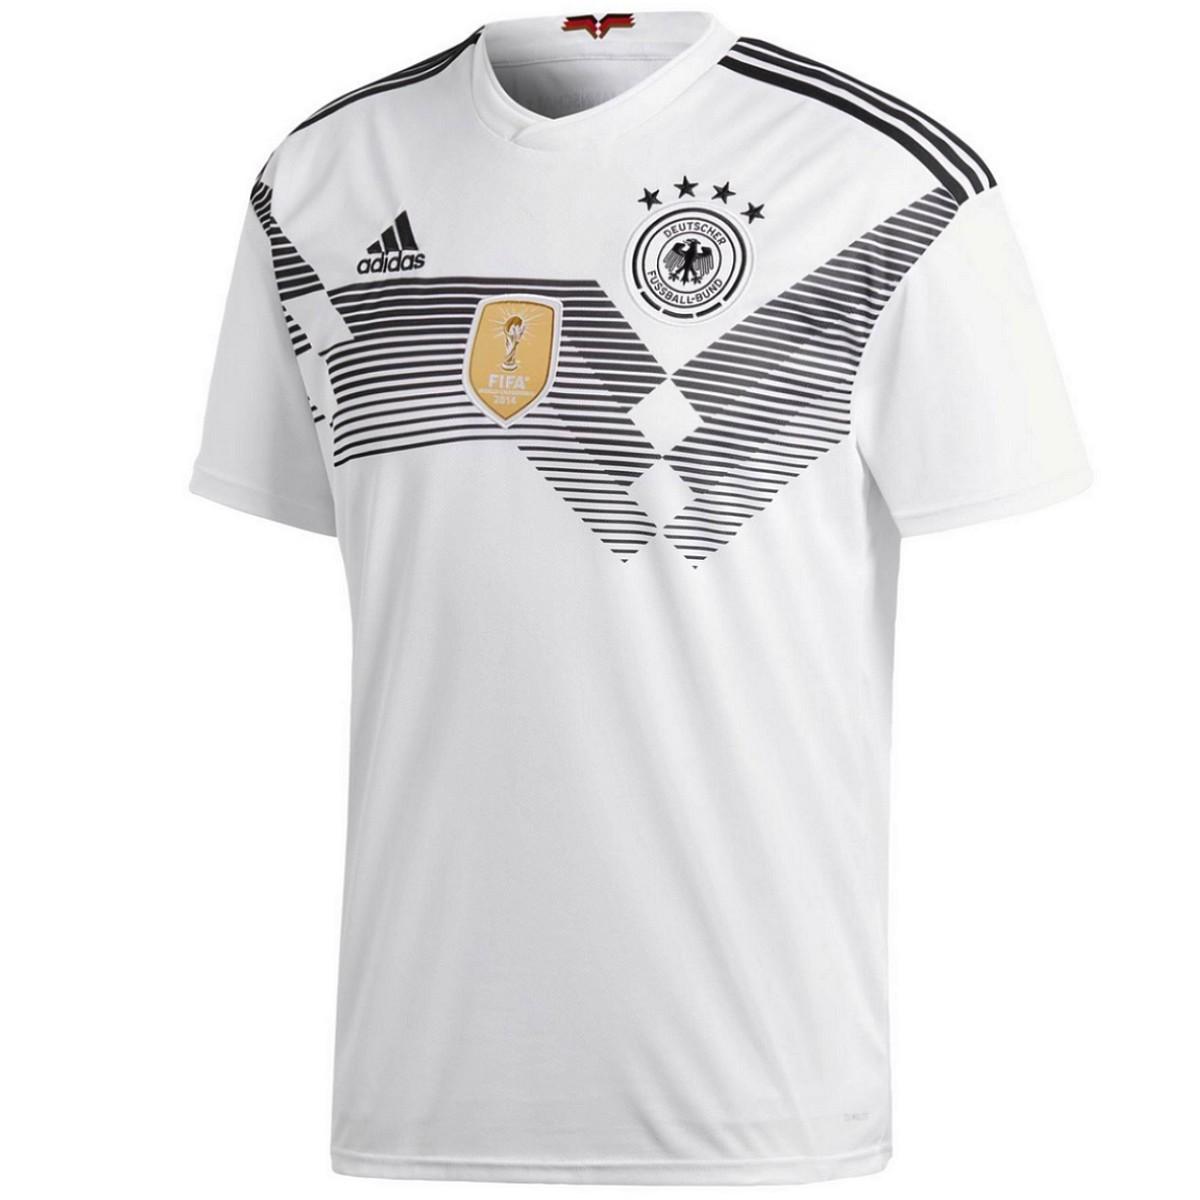 Germany Home football shirt World Cup 2018 - Adidas